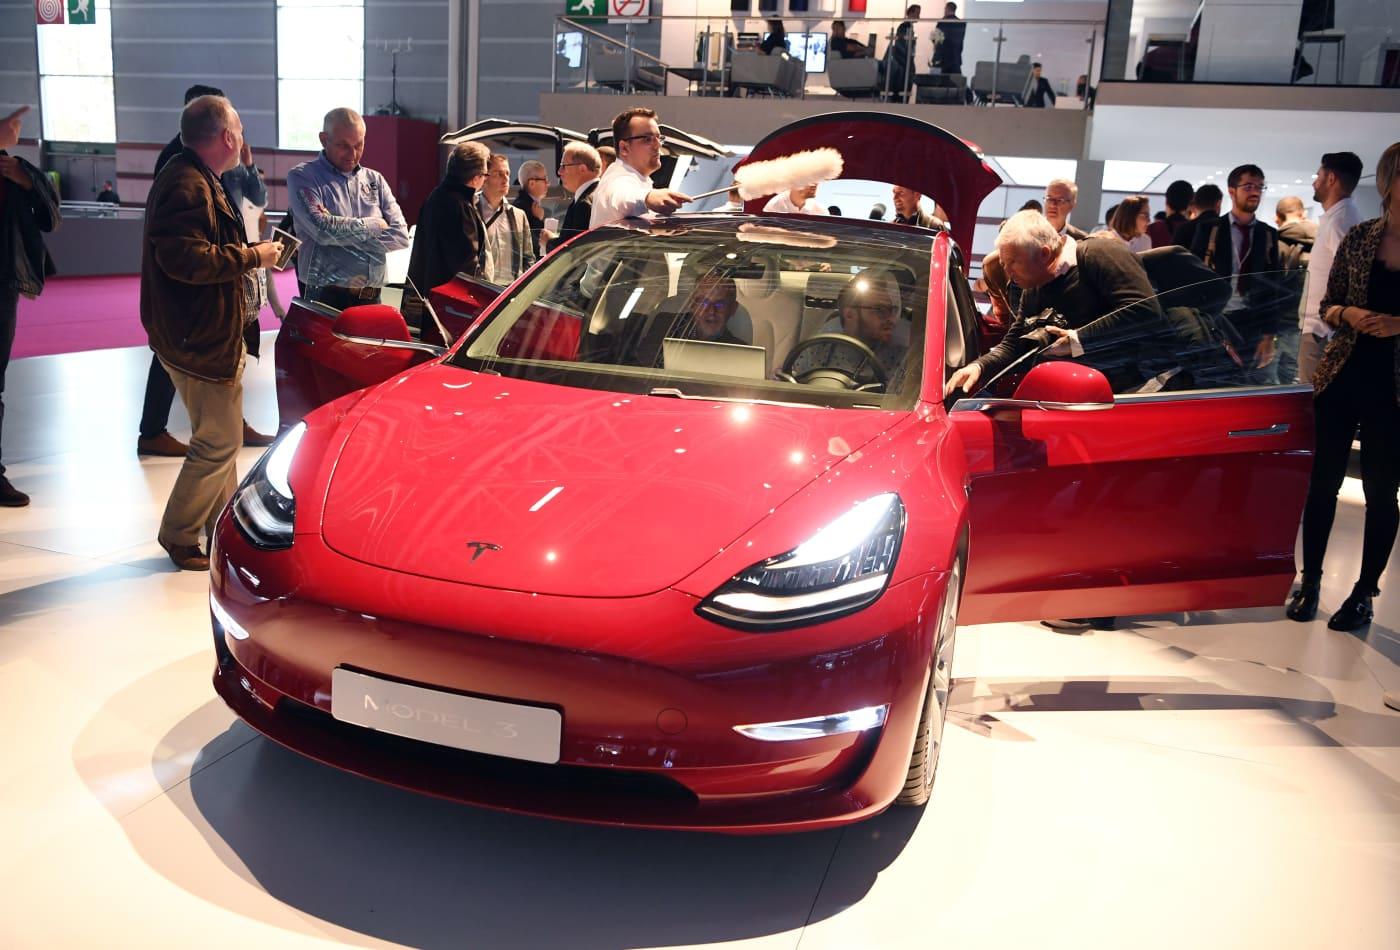 Investors should consider selling some Tesla shares and 'let the rest run,' Jim Cramer says